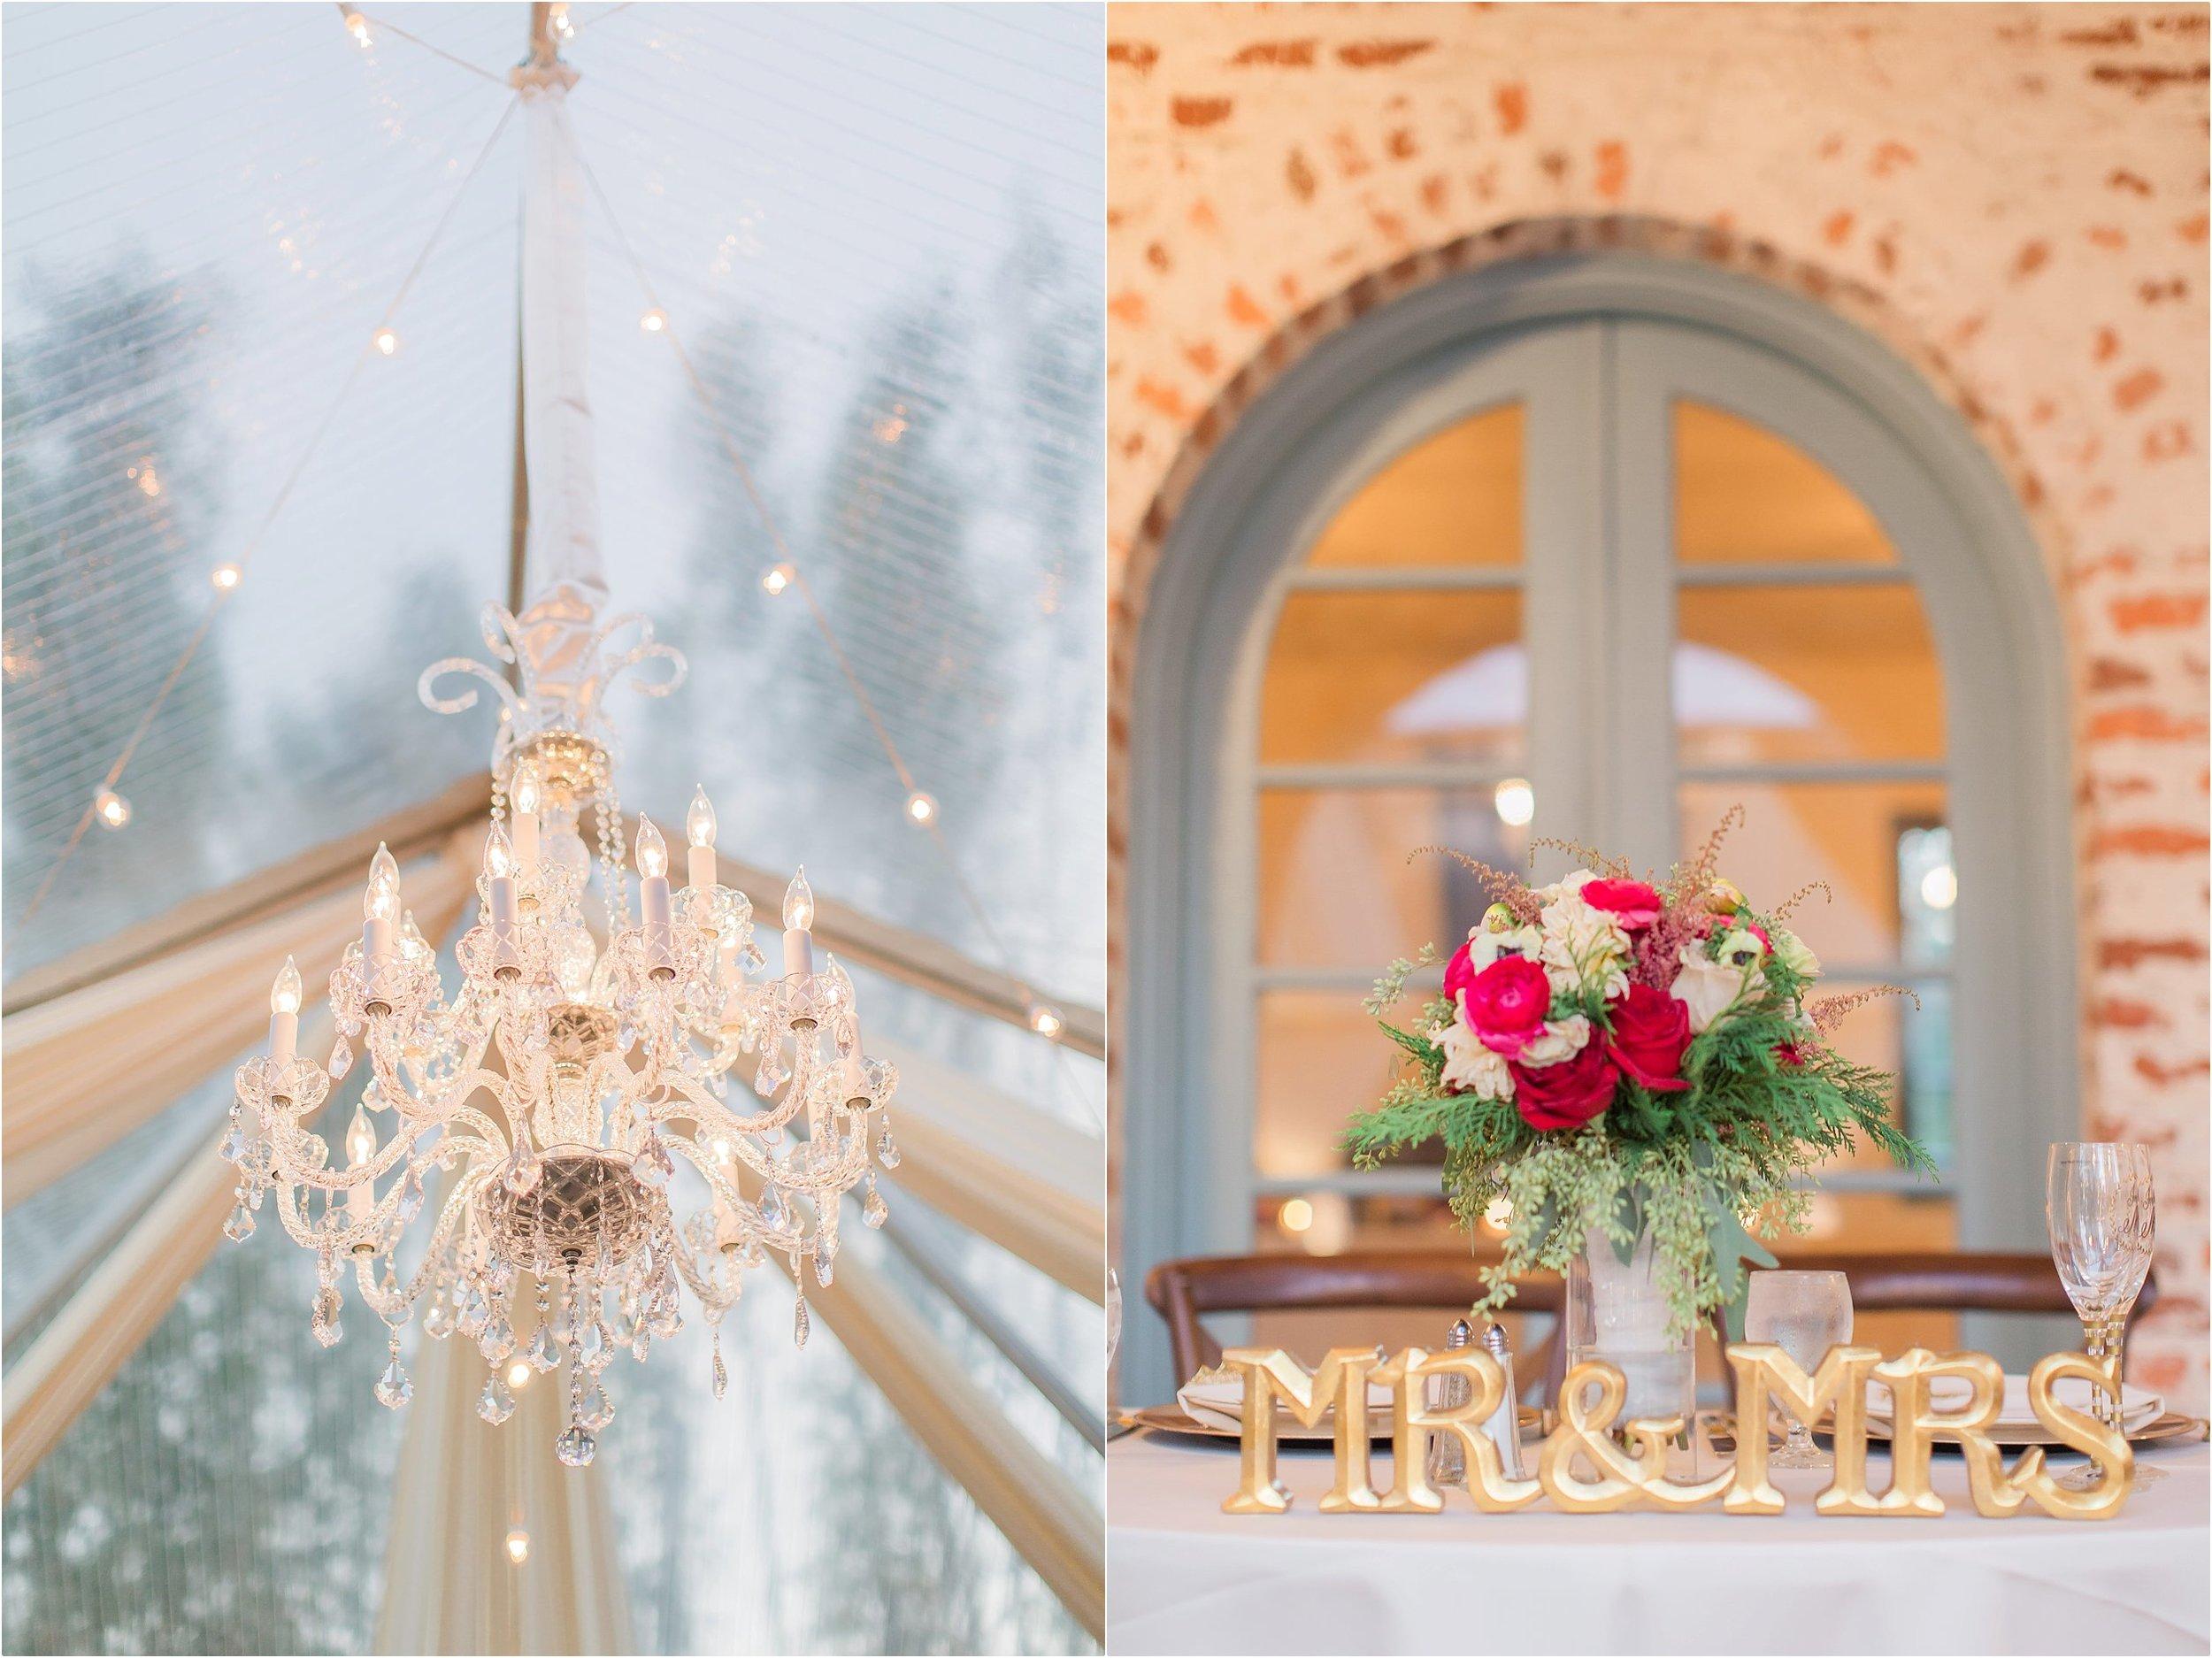 Casa_Feliz_Alfond_Inn_Winter_WeddingndhamGrandWedding_0097.jpg